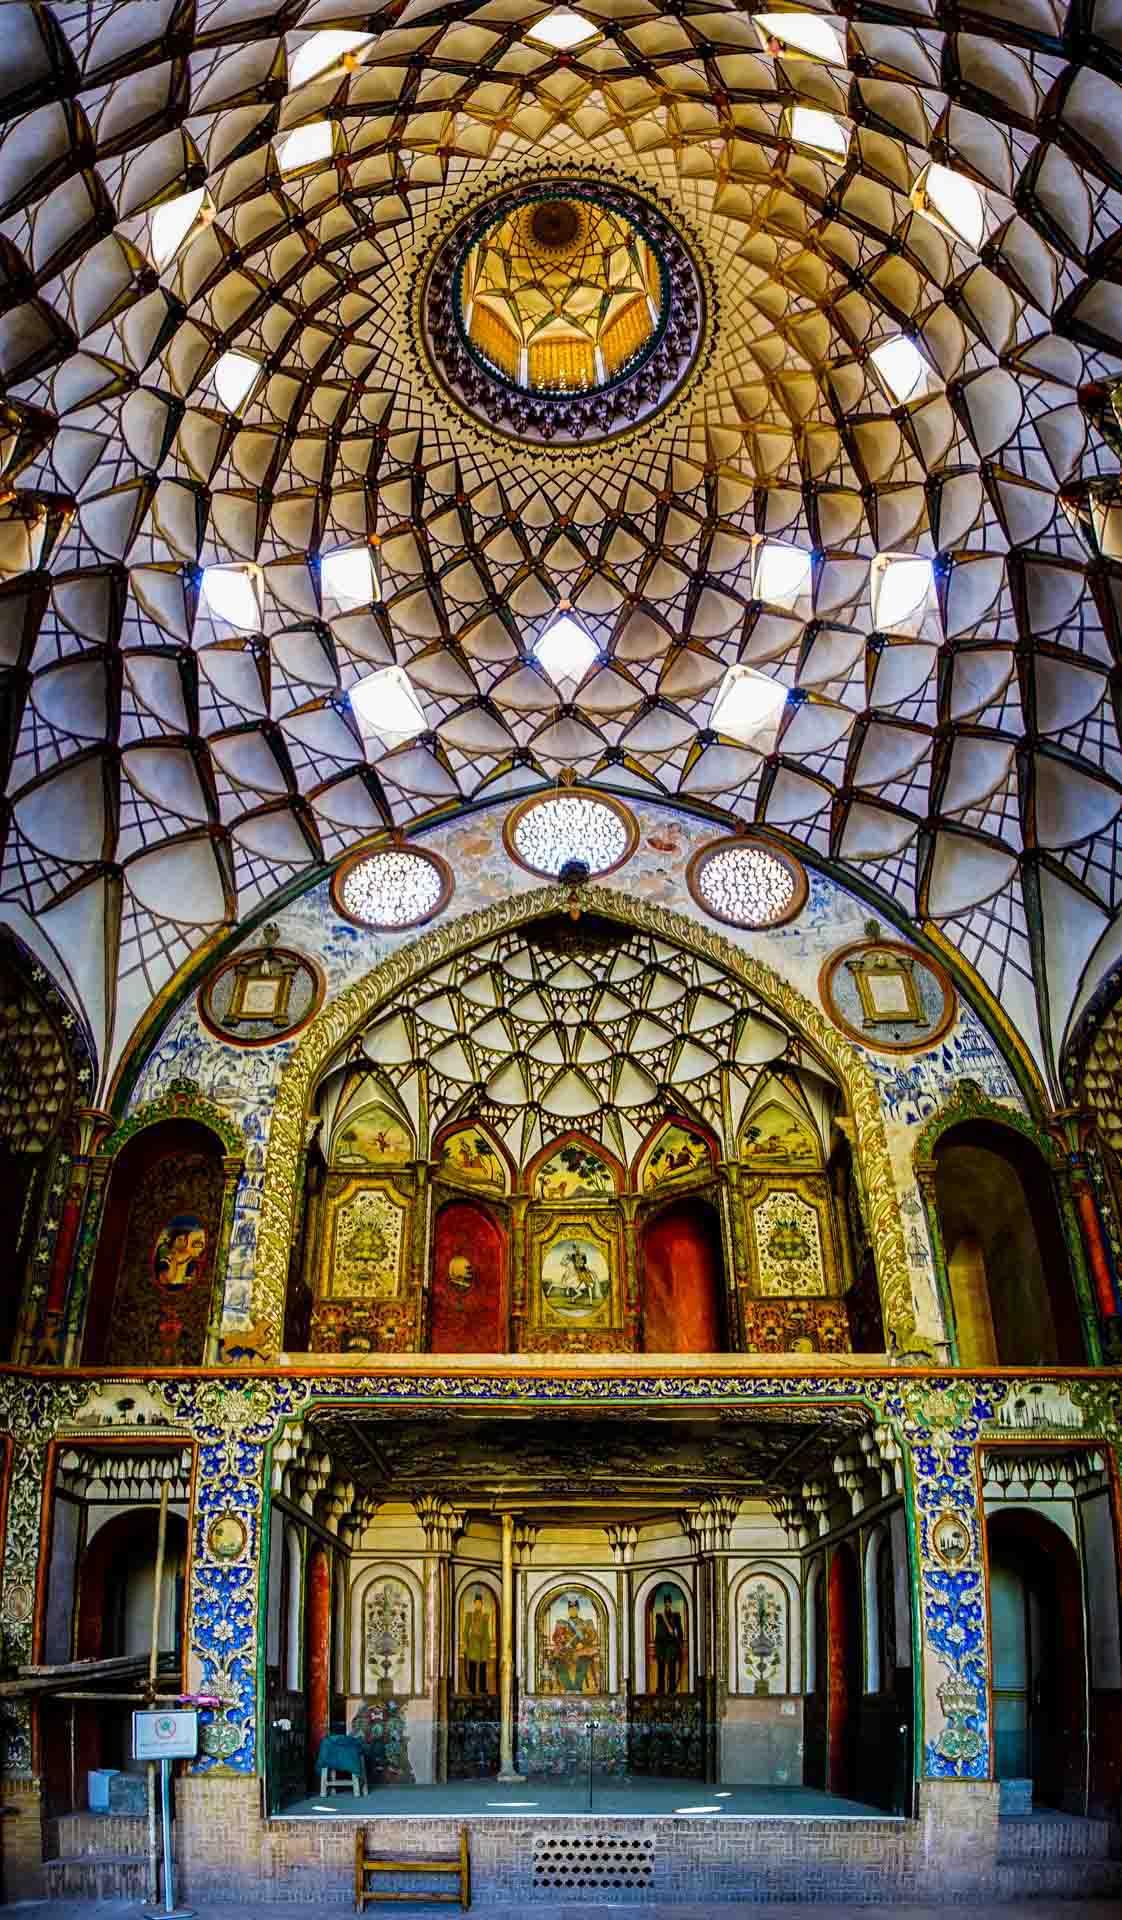 Borujerdi Historical House 1, kashan, iran, pescart, photo blog, travel blog, blog, photo travel blog, enrico pescantini, pescantini